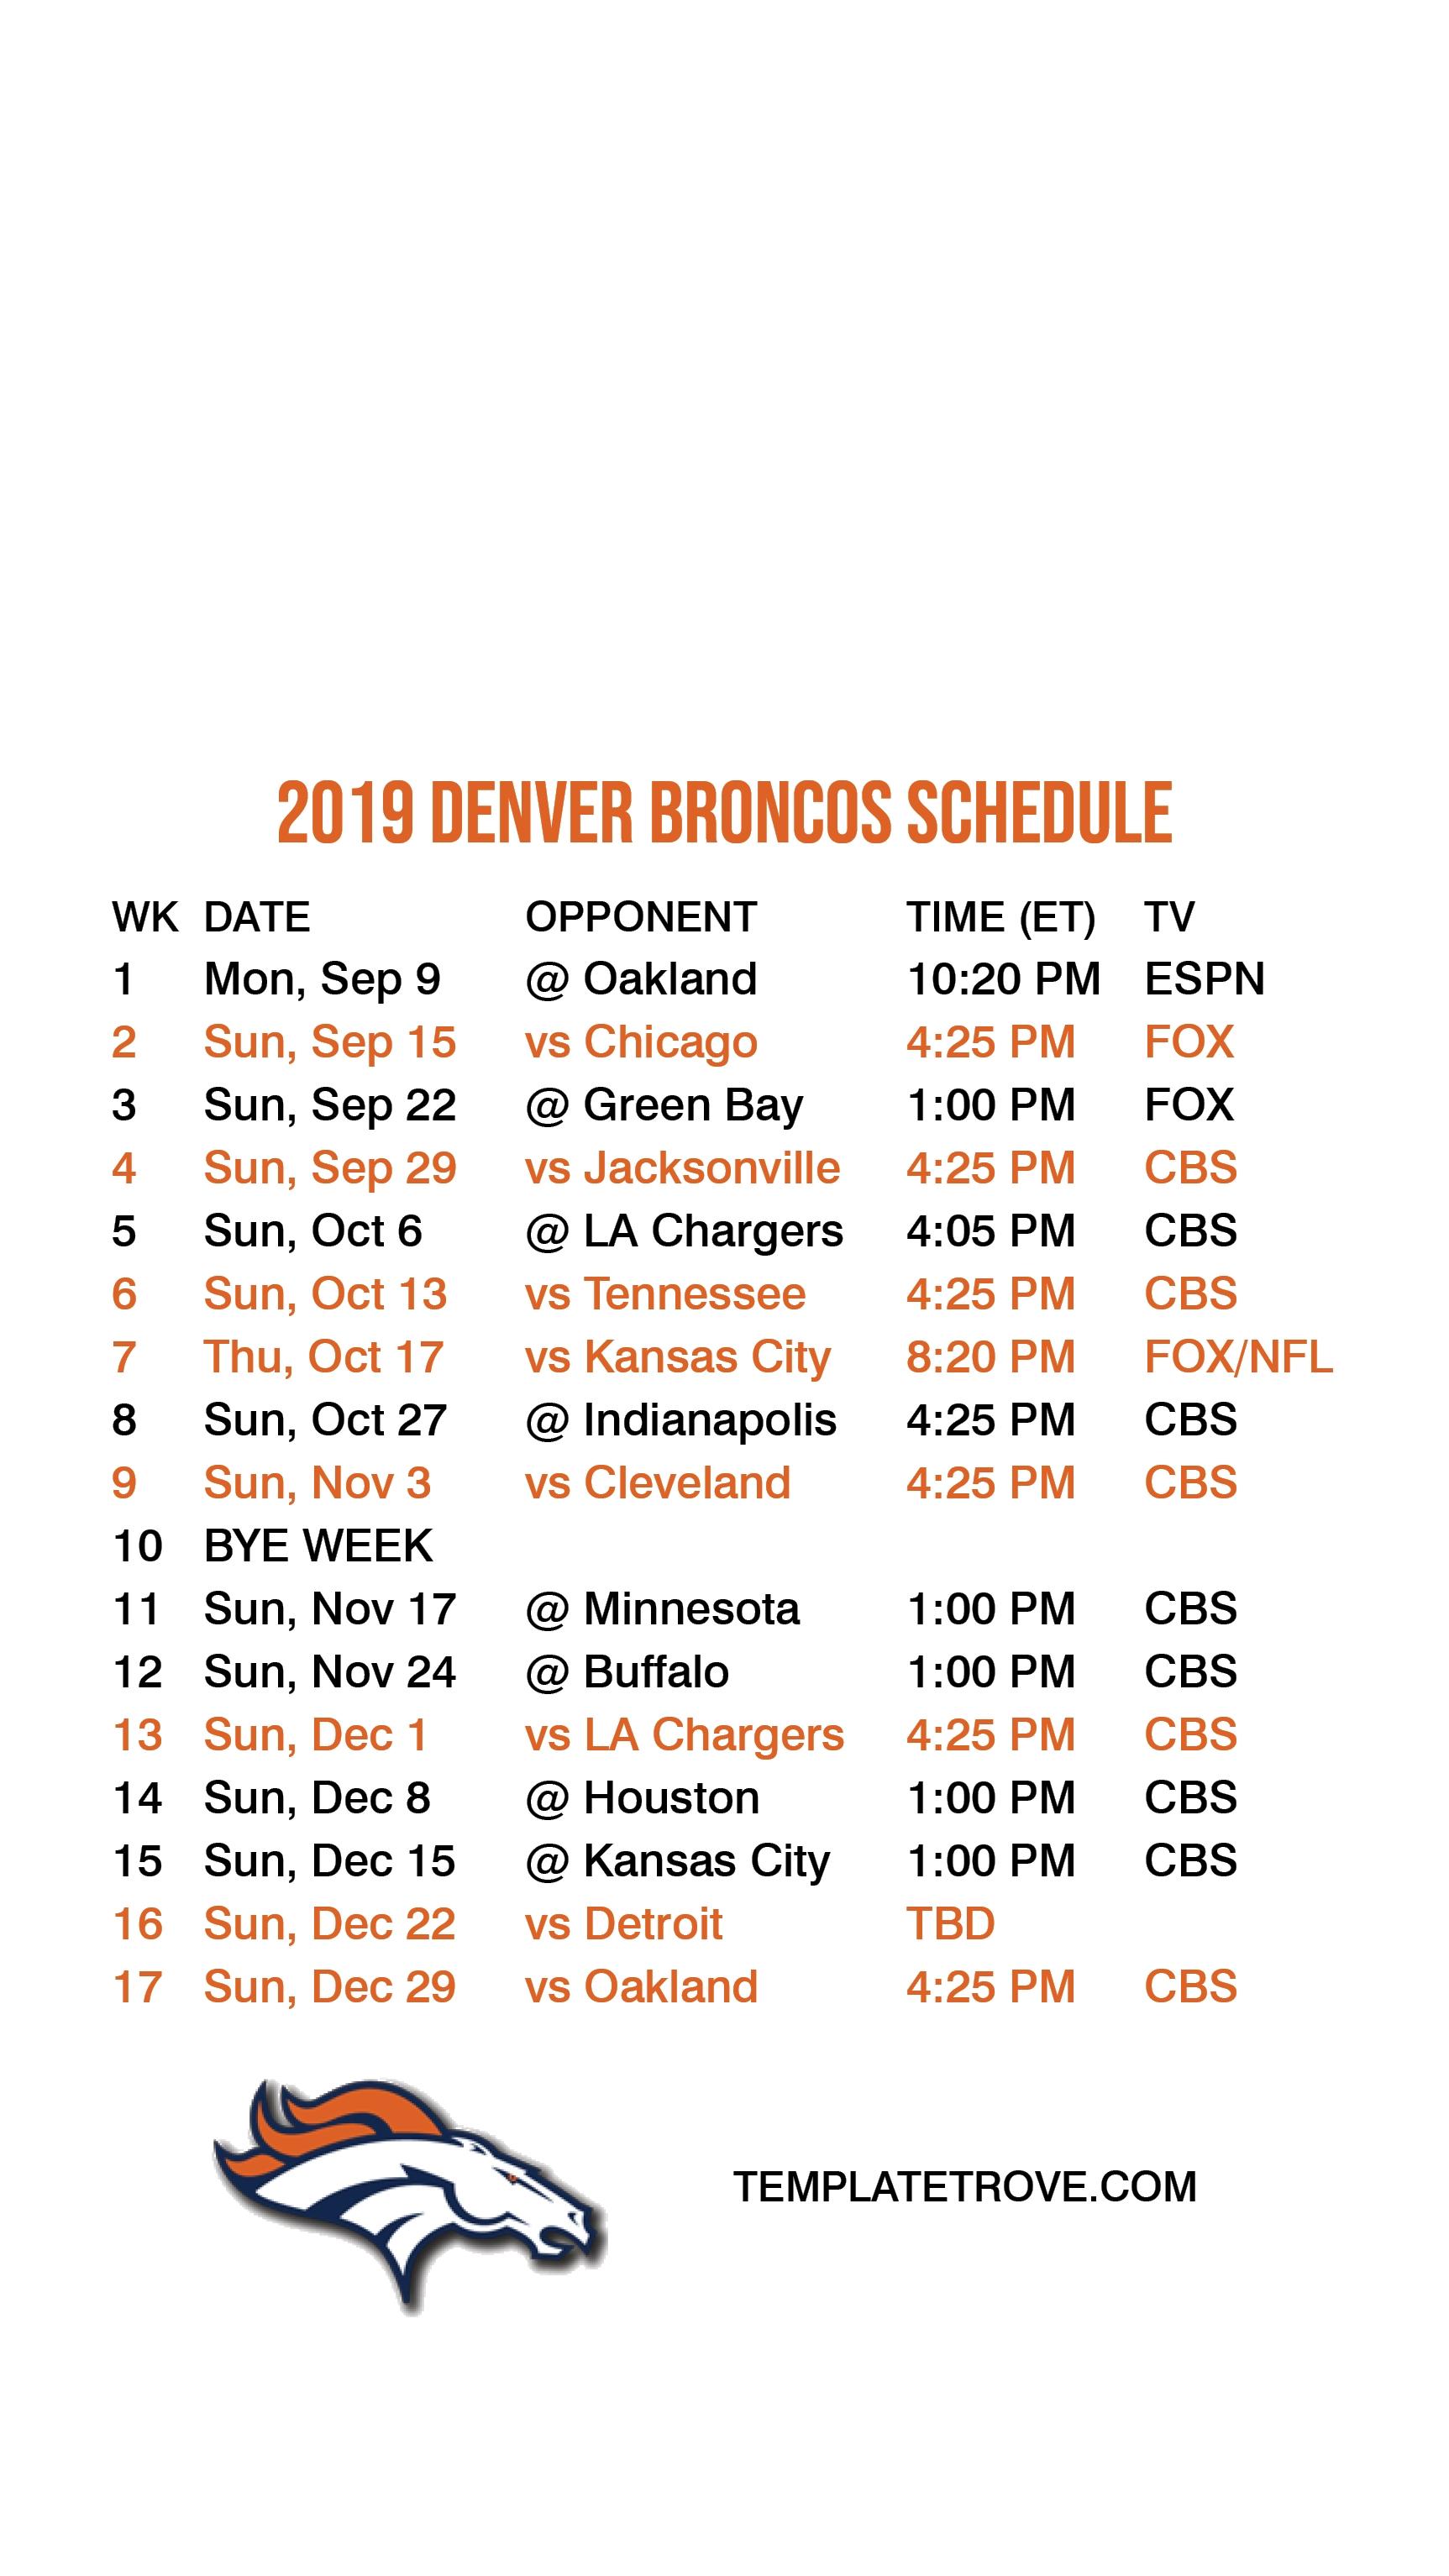 2019-2020 Denver Broncos Lock Screen Schedule For Iphone 6-7 for Printable Nfl Schedule 2019 2020 Season